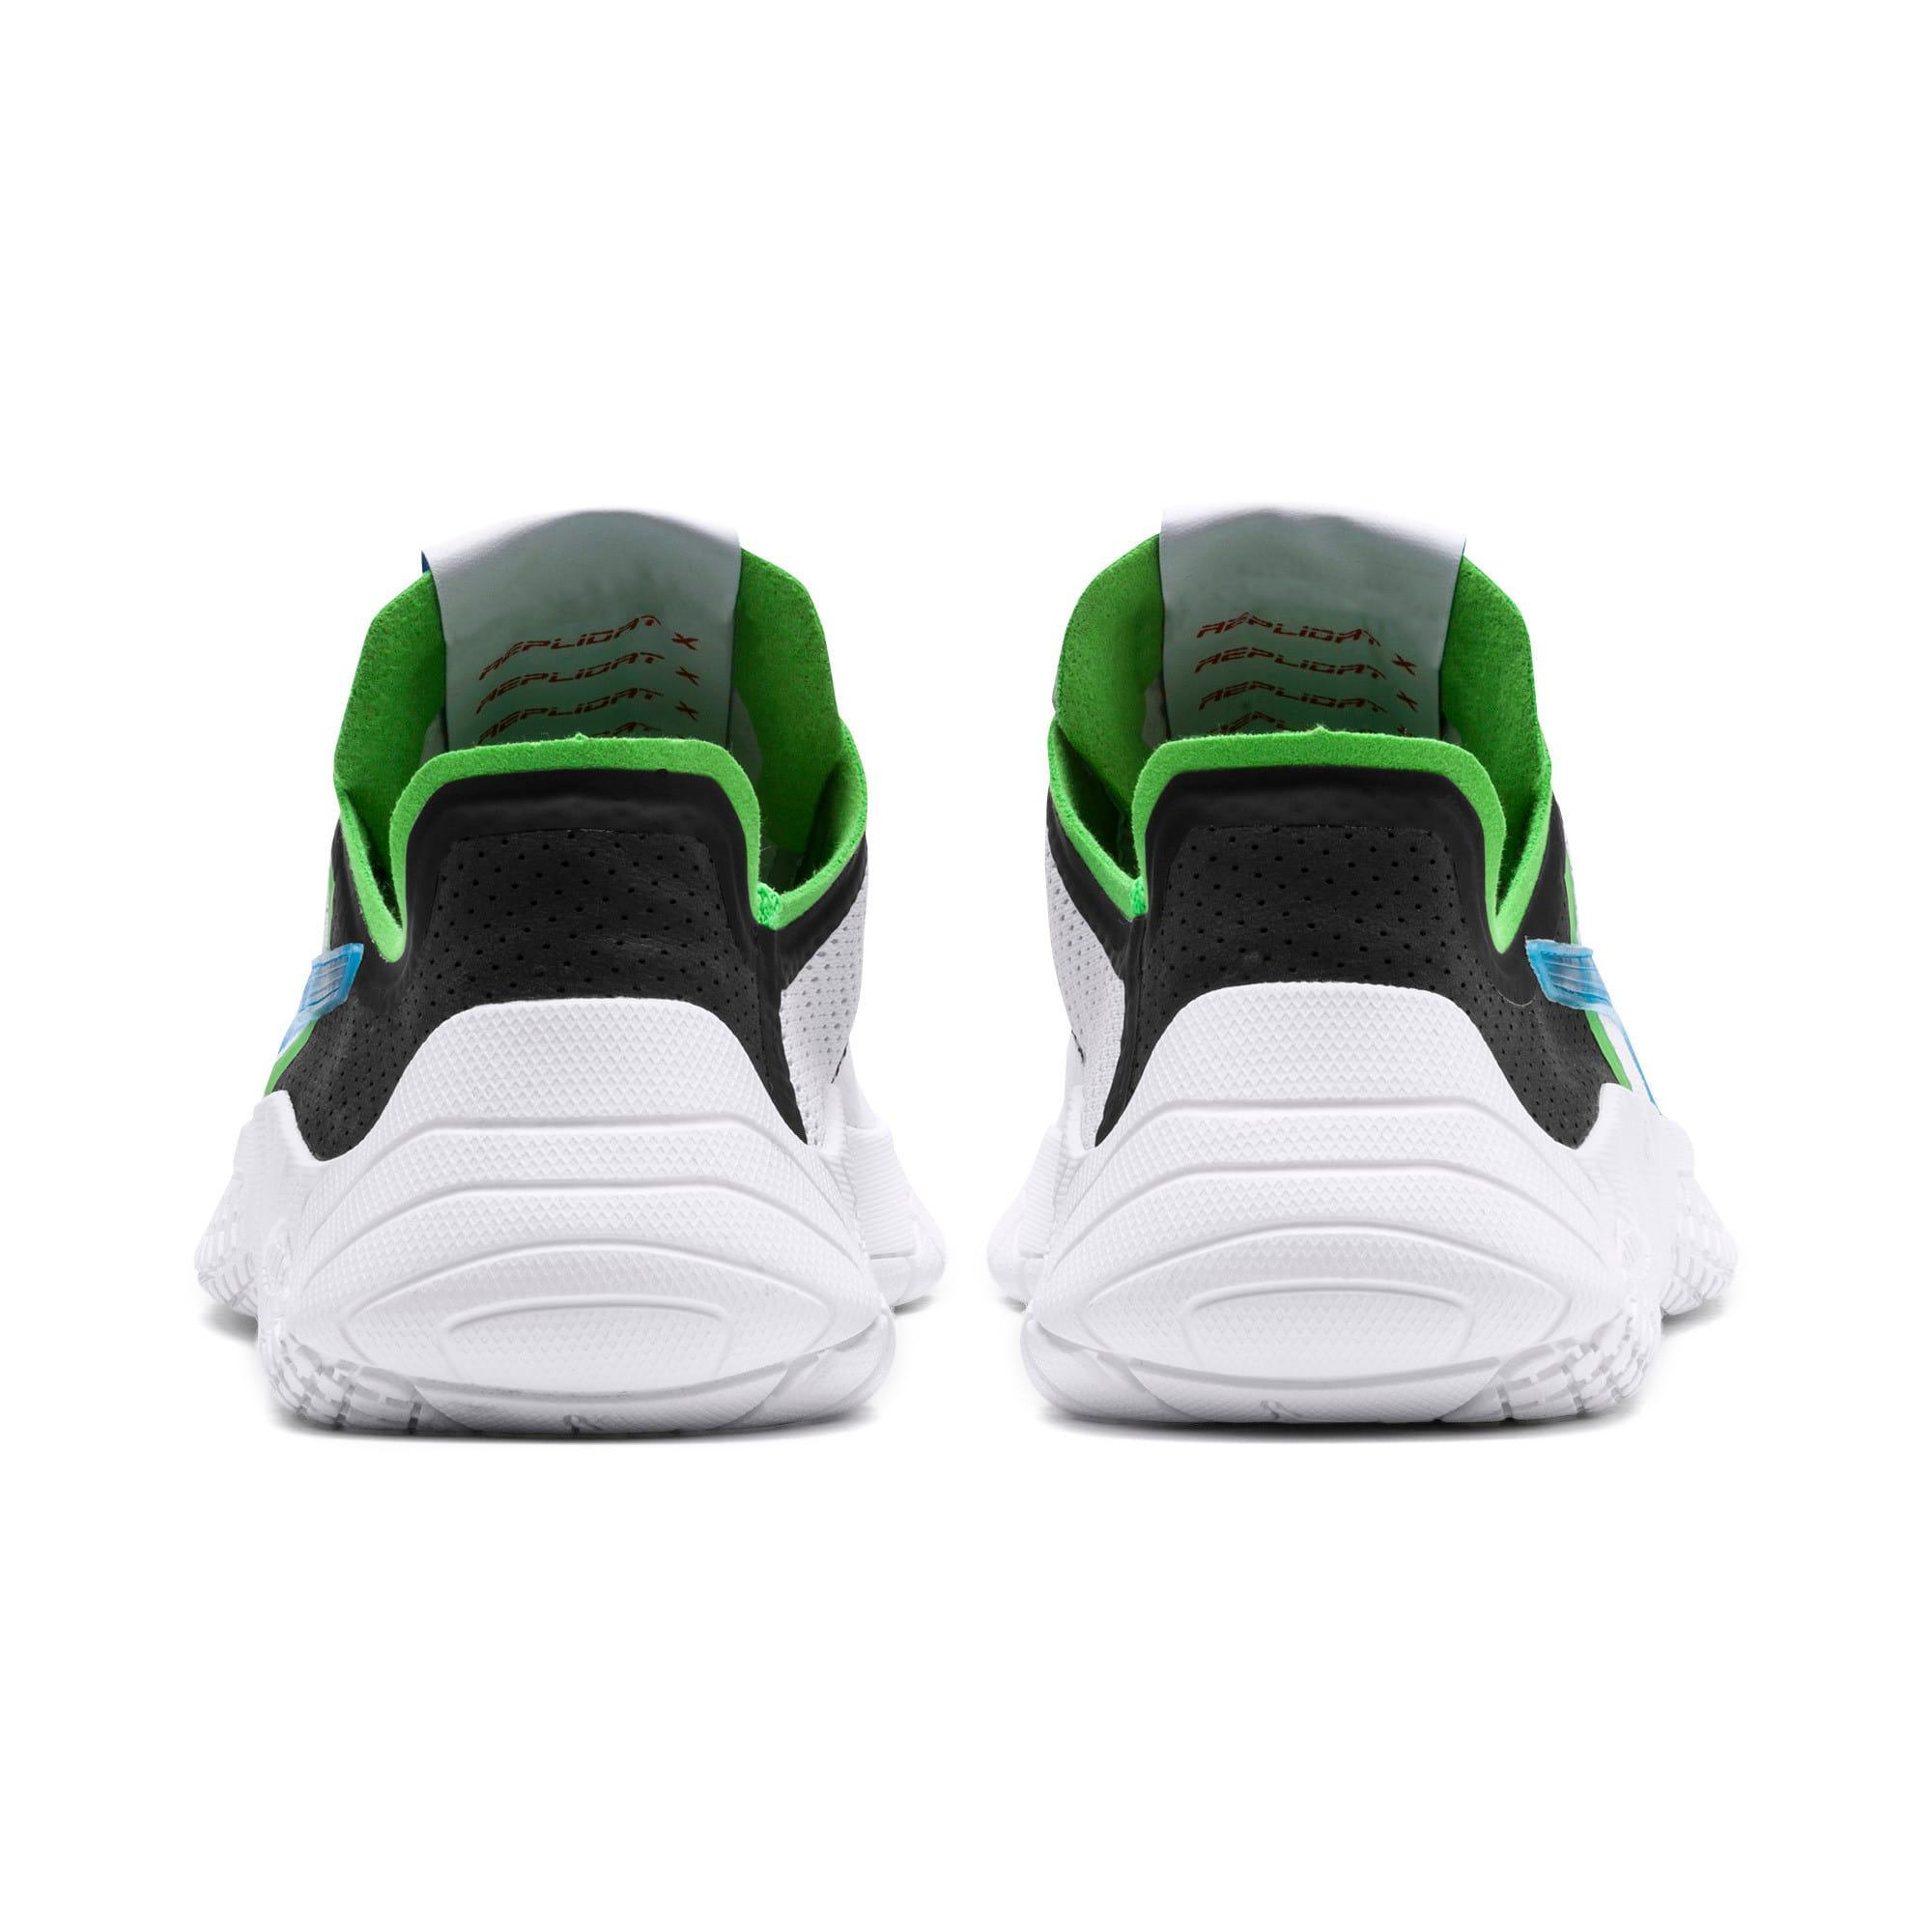 Thumbnail 4 of Replicat-X Pirelli Motorsport Shoes, White-Black-Classic Green, medium